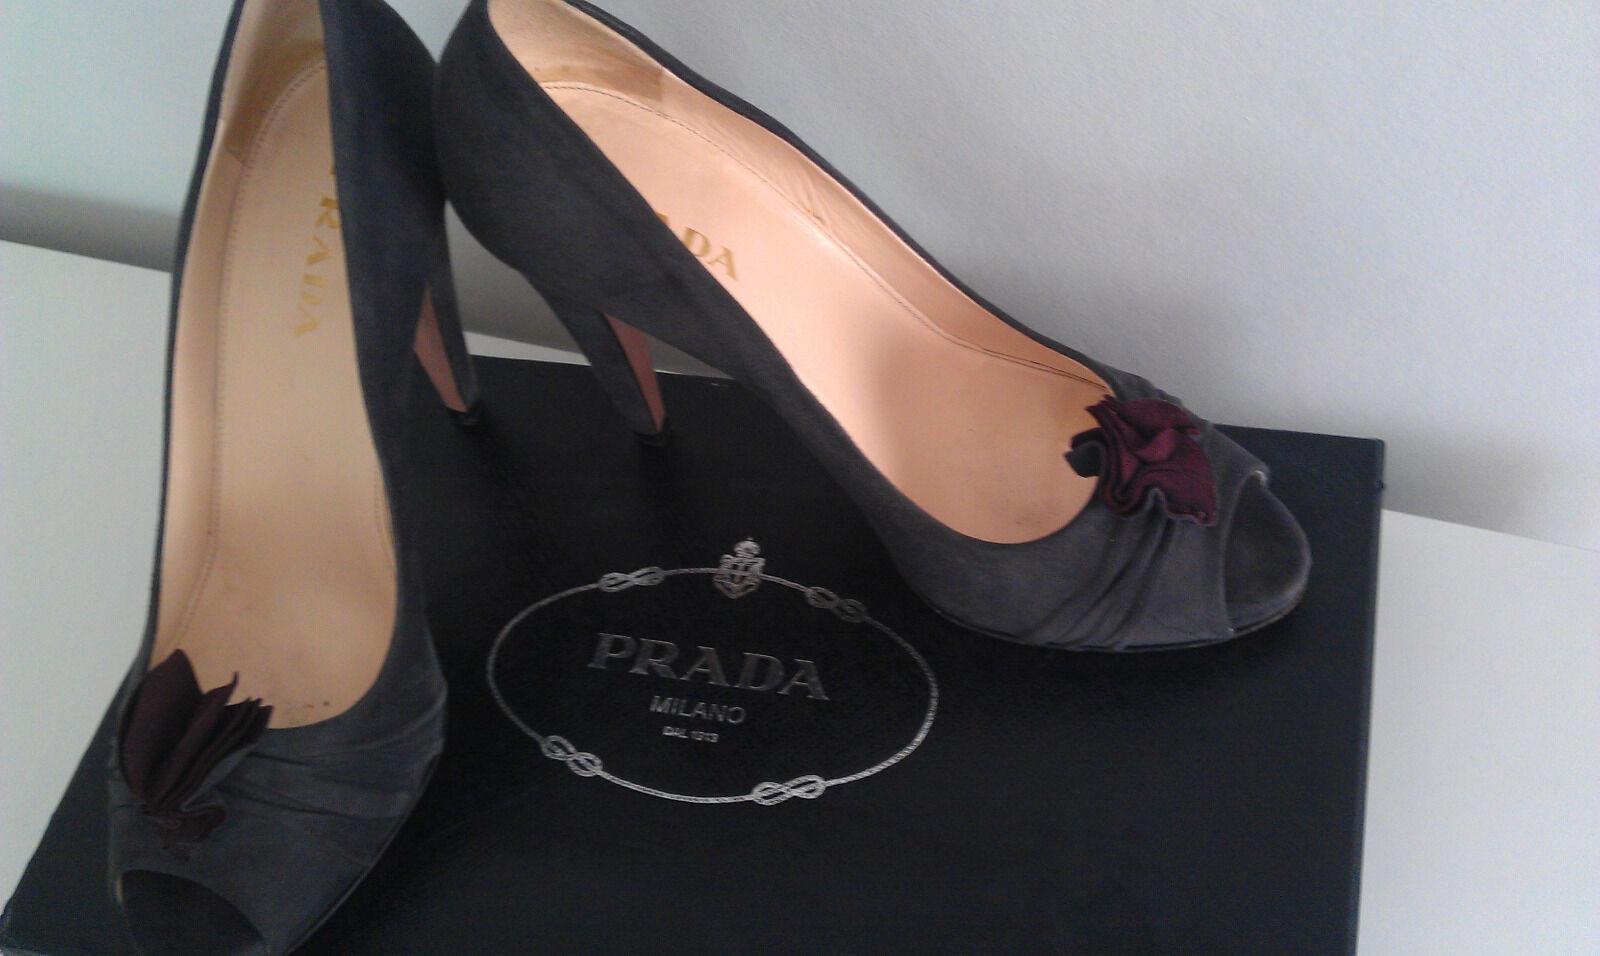 Prada Damenschuhe Top. Slipper Scarpe – Exklusiv  Gr.37 (tats. 36) High Heels